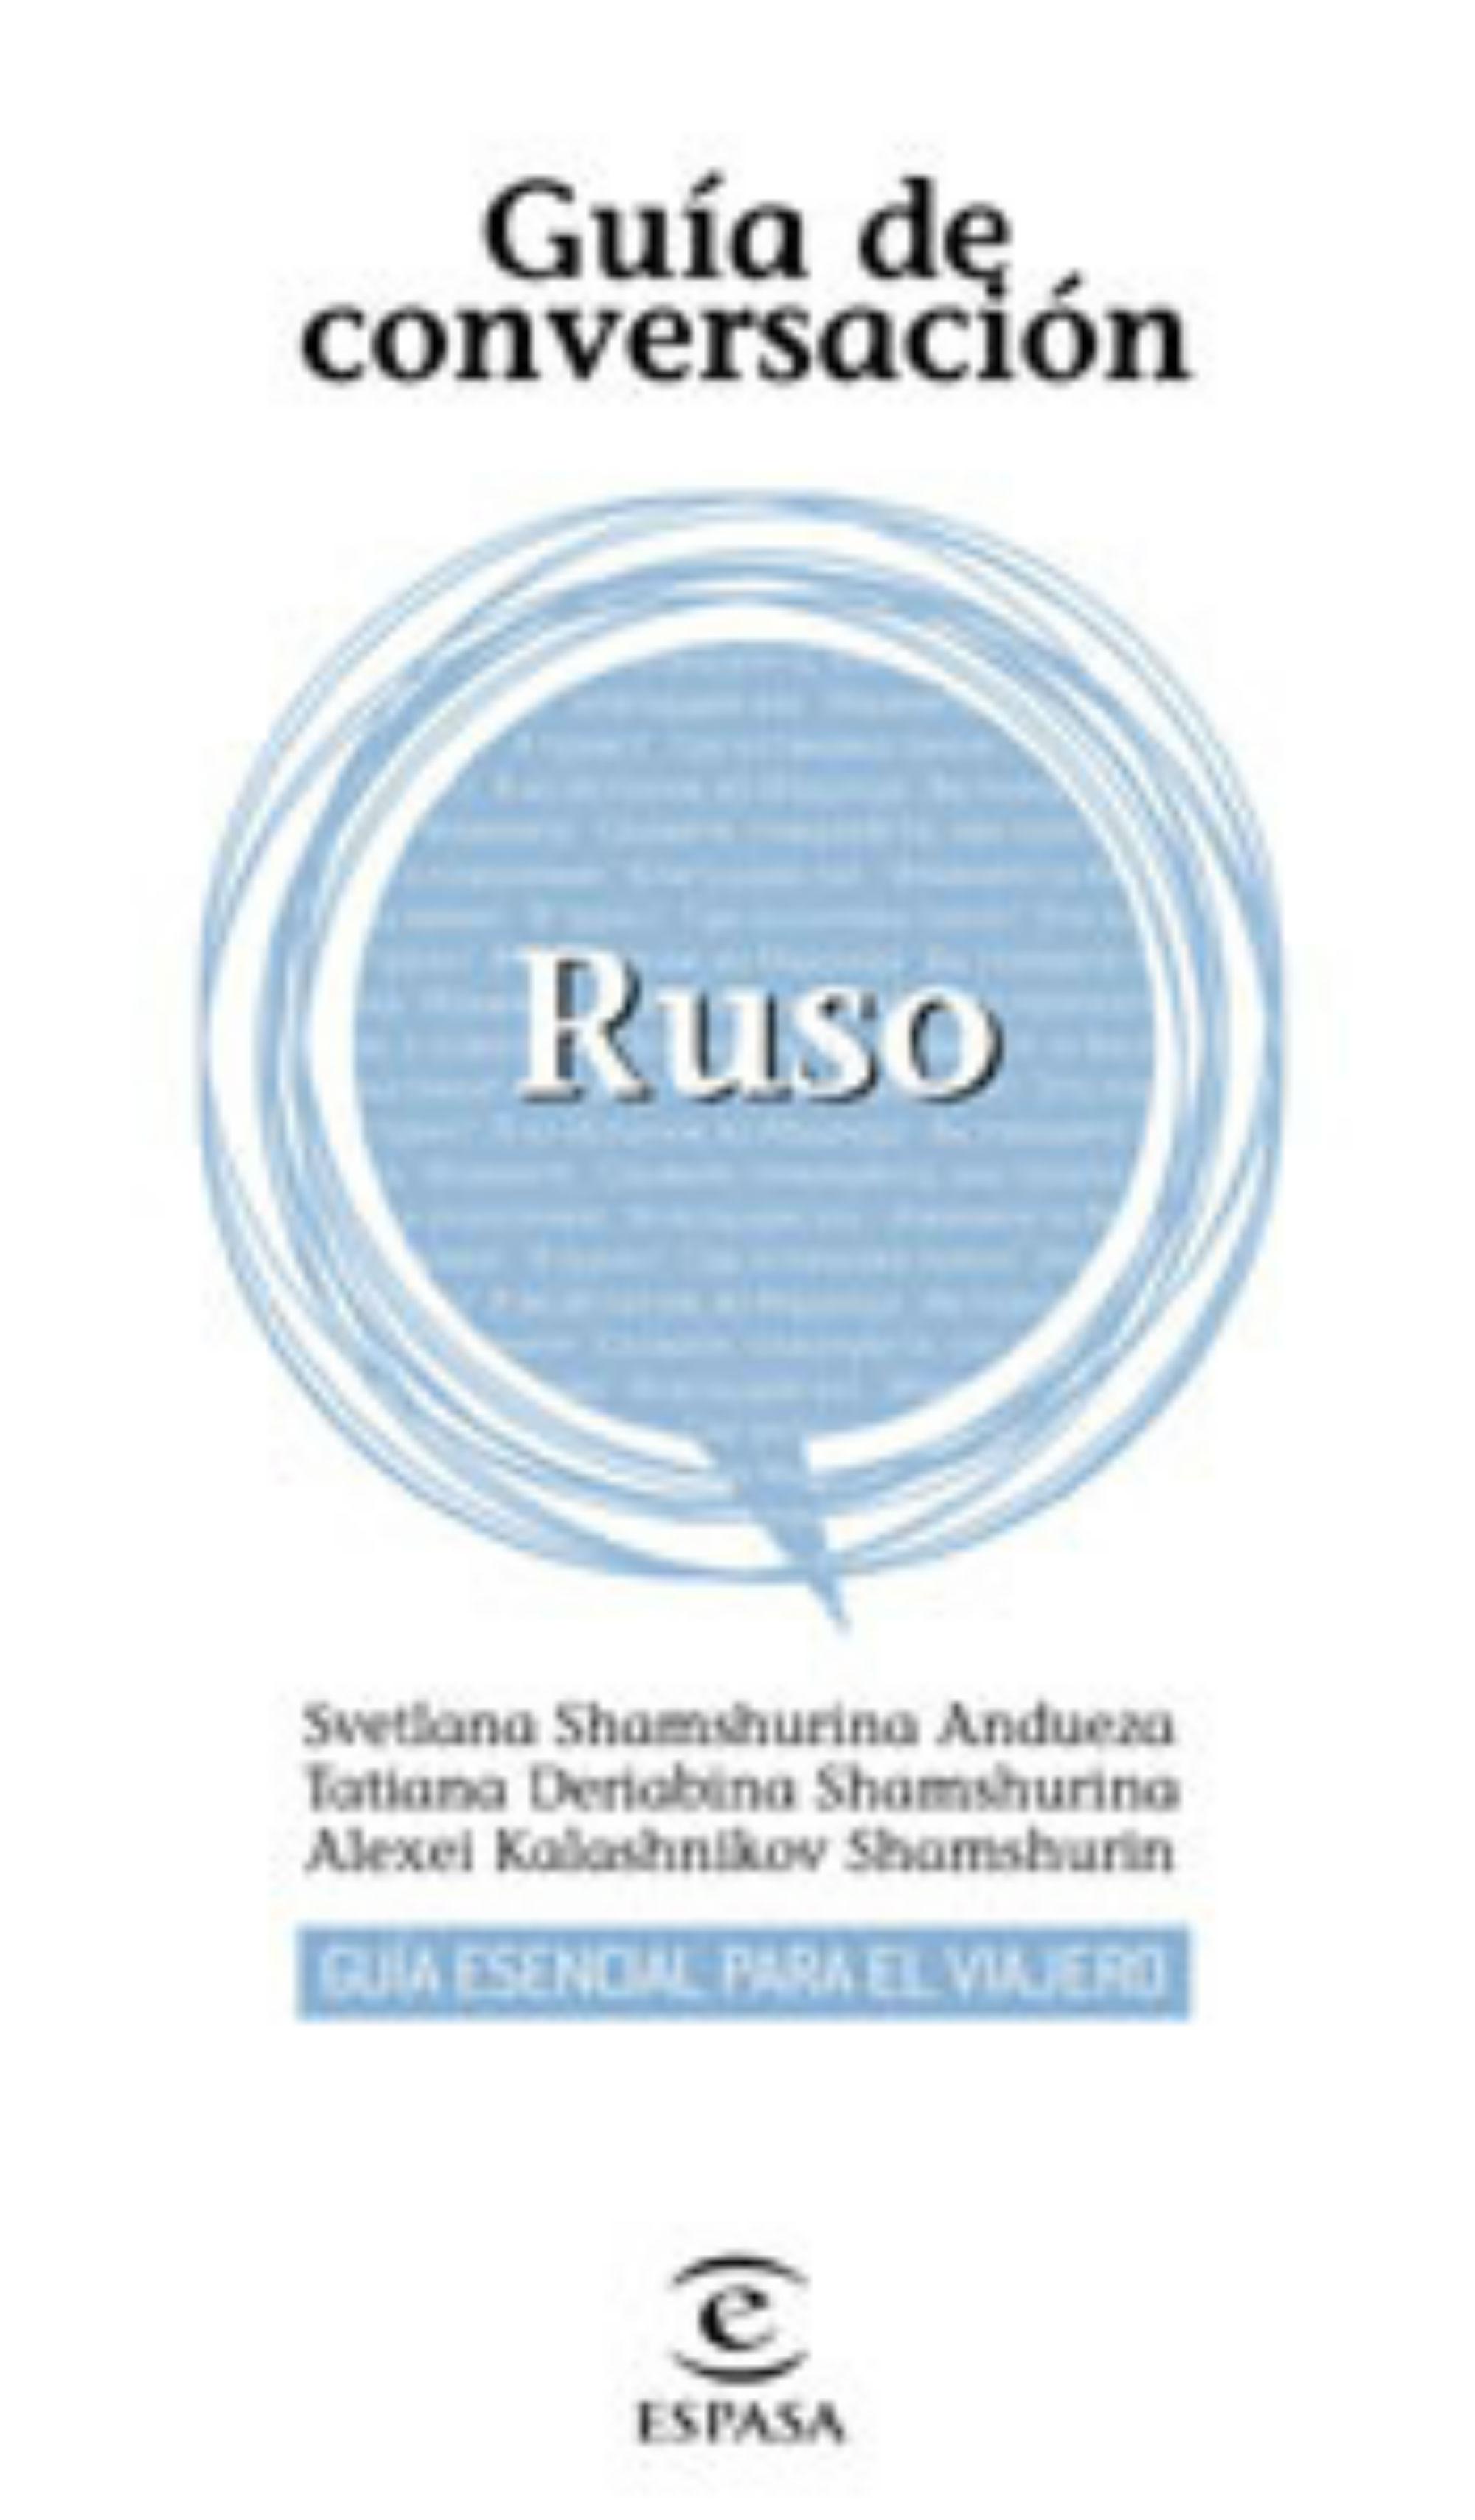 Guia De Conversacion Ruso por Vv.aa. epub